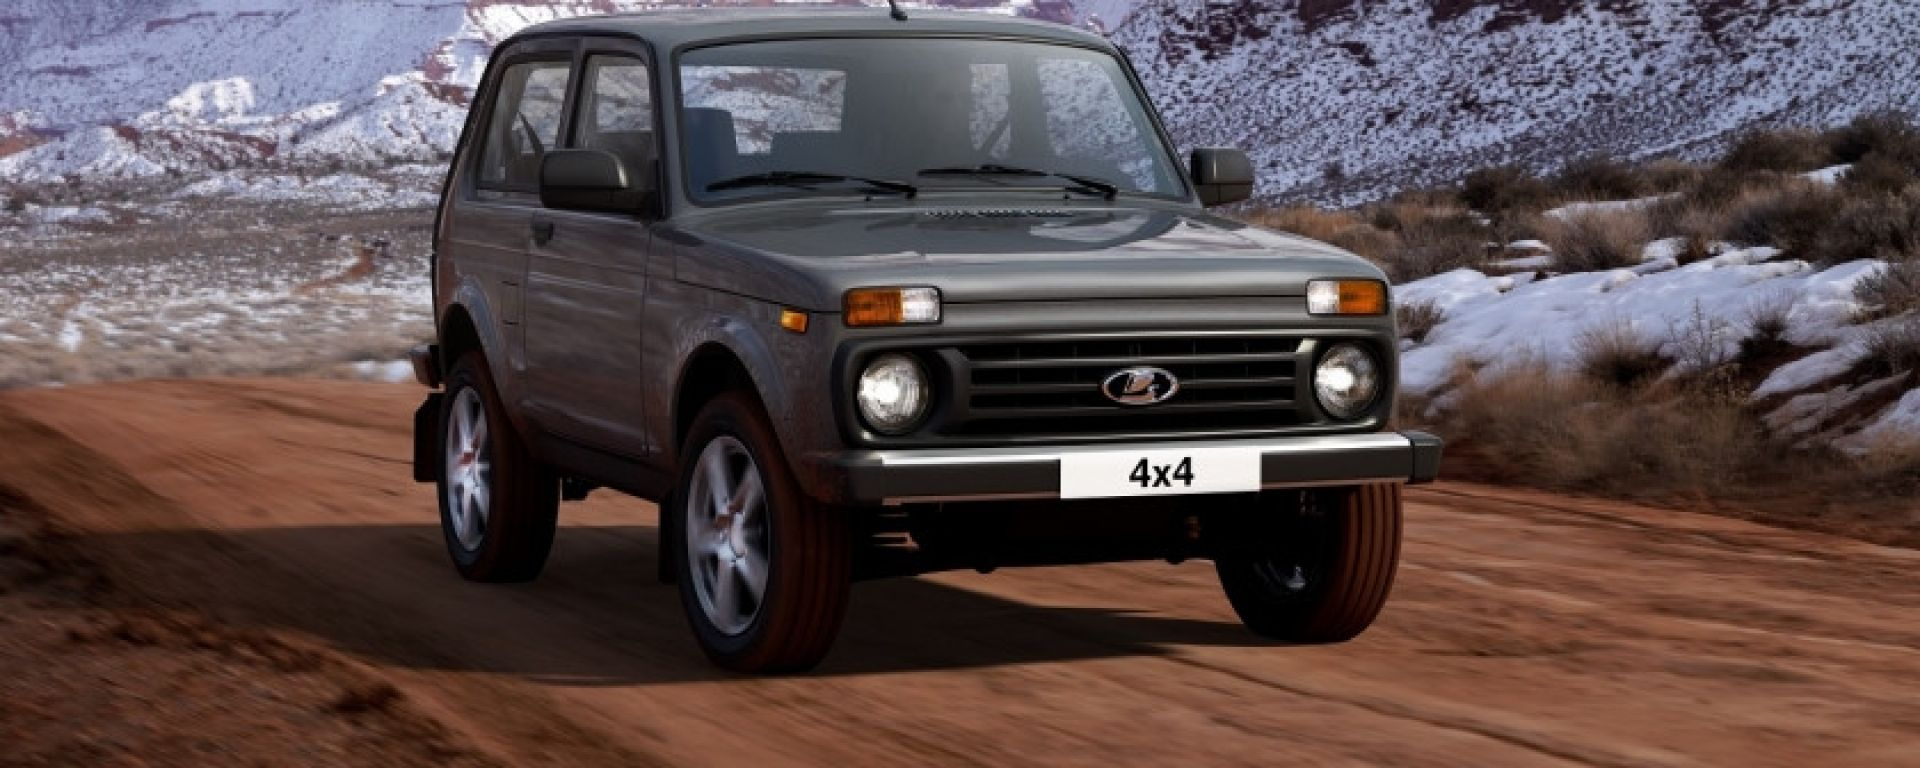 Lada Niva 2020: il restyling